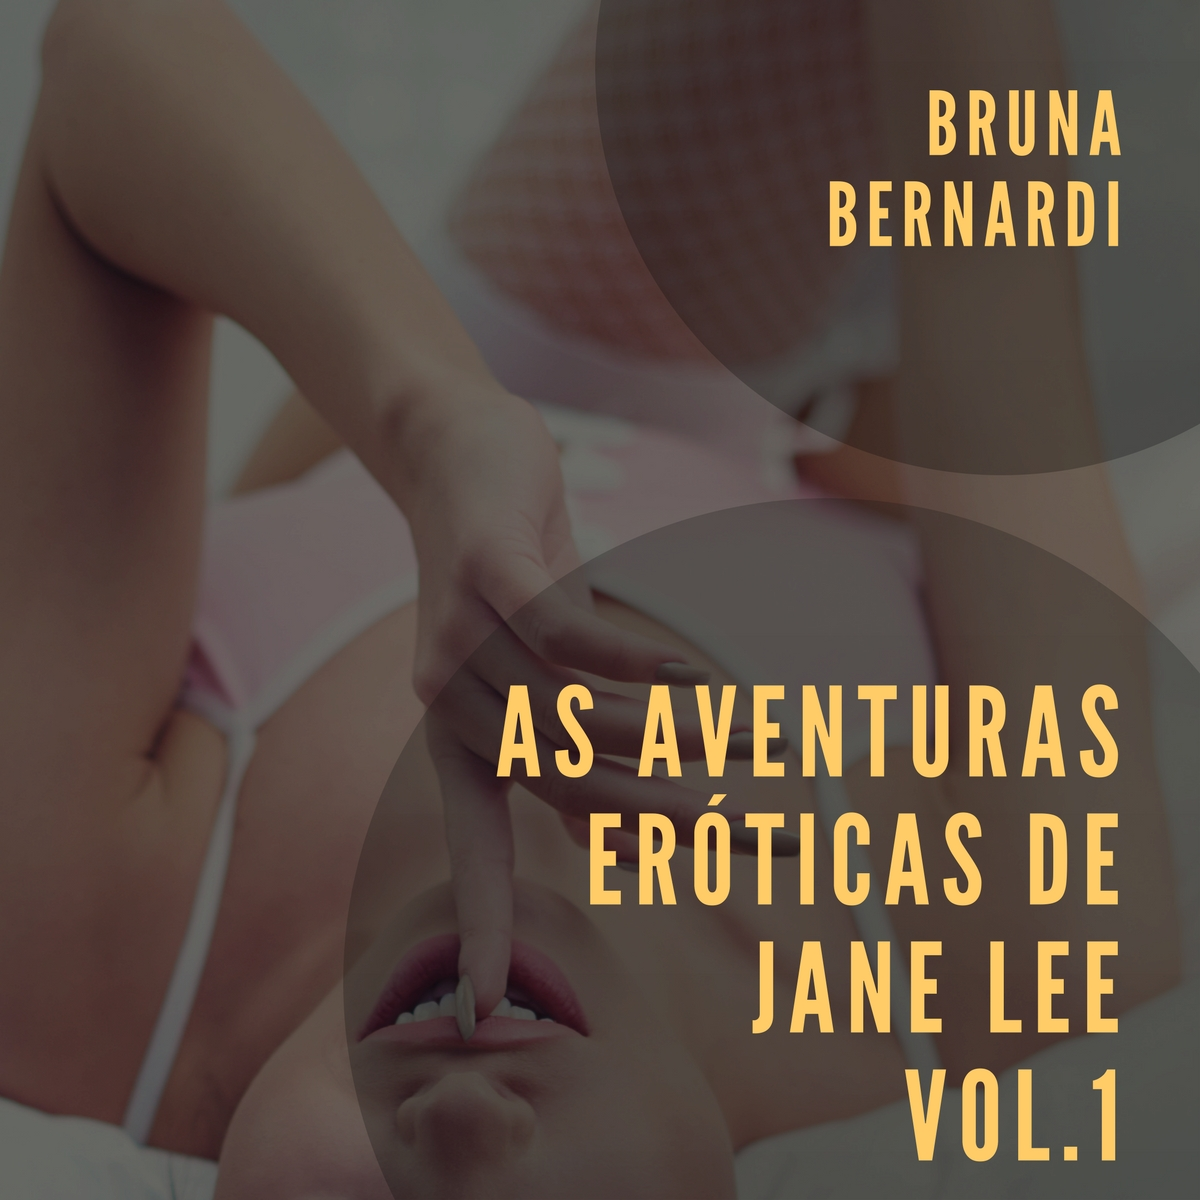 Capa_aventuras eróticas de Jane Lee 5.jpg